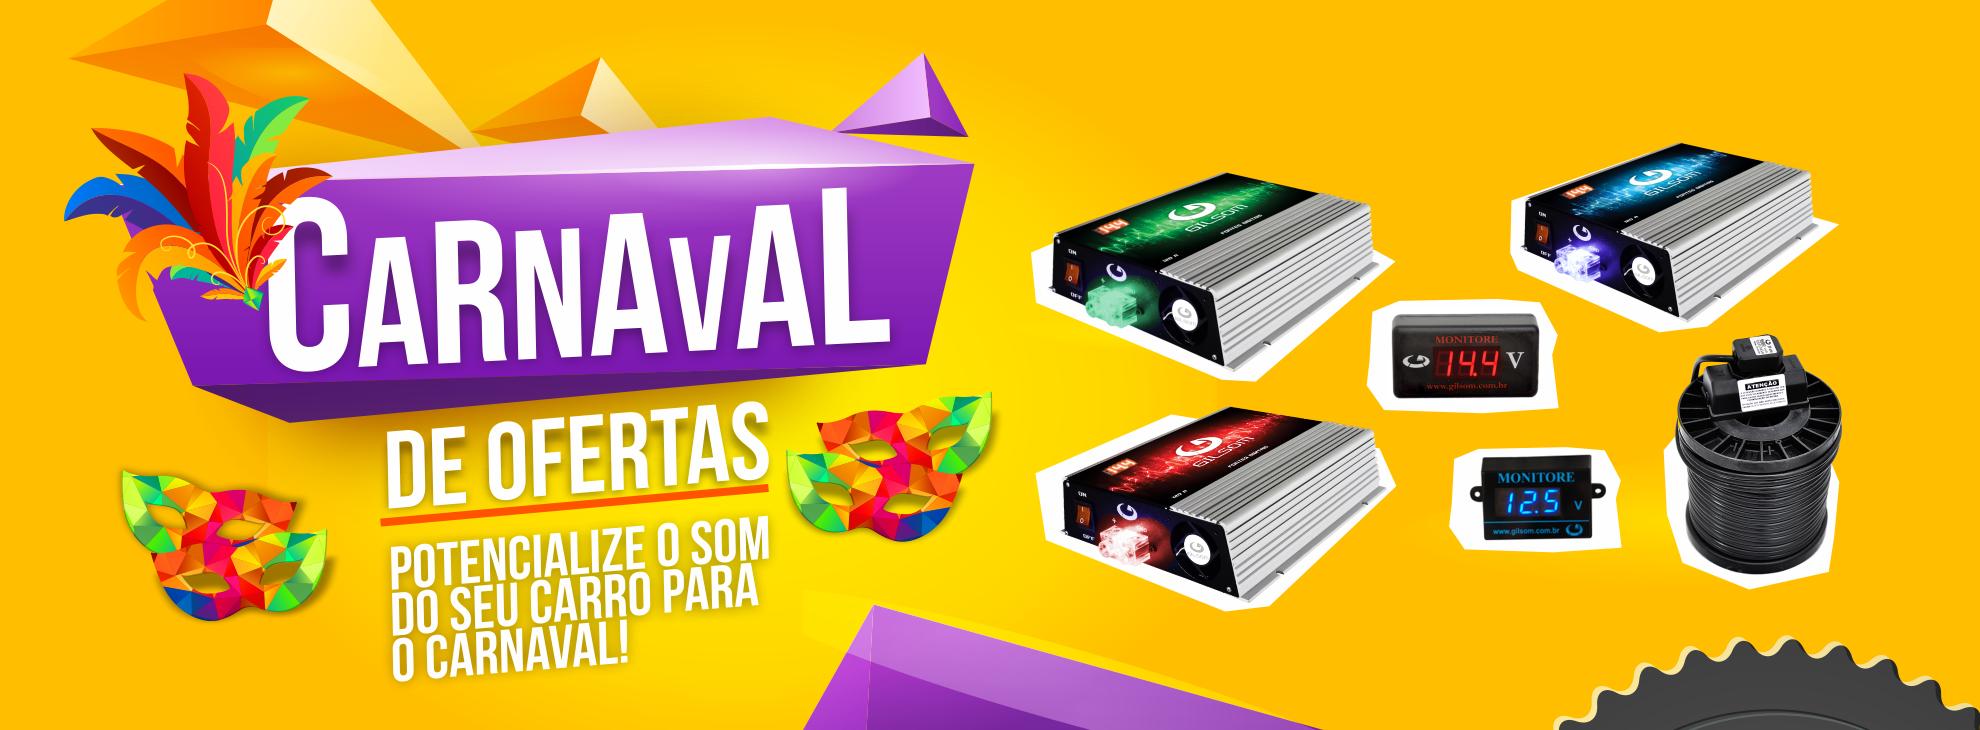 banner_carnaval